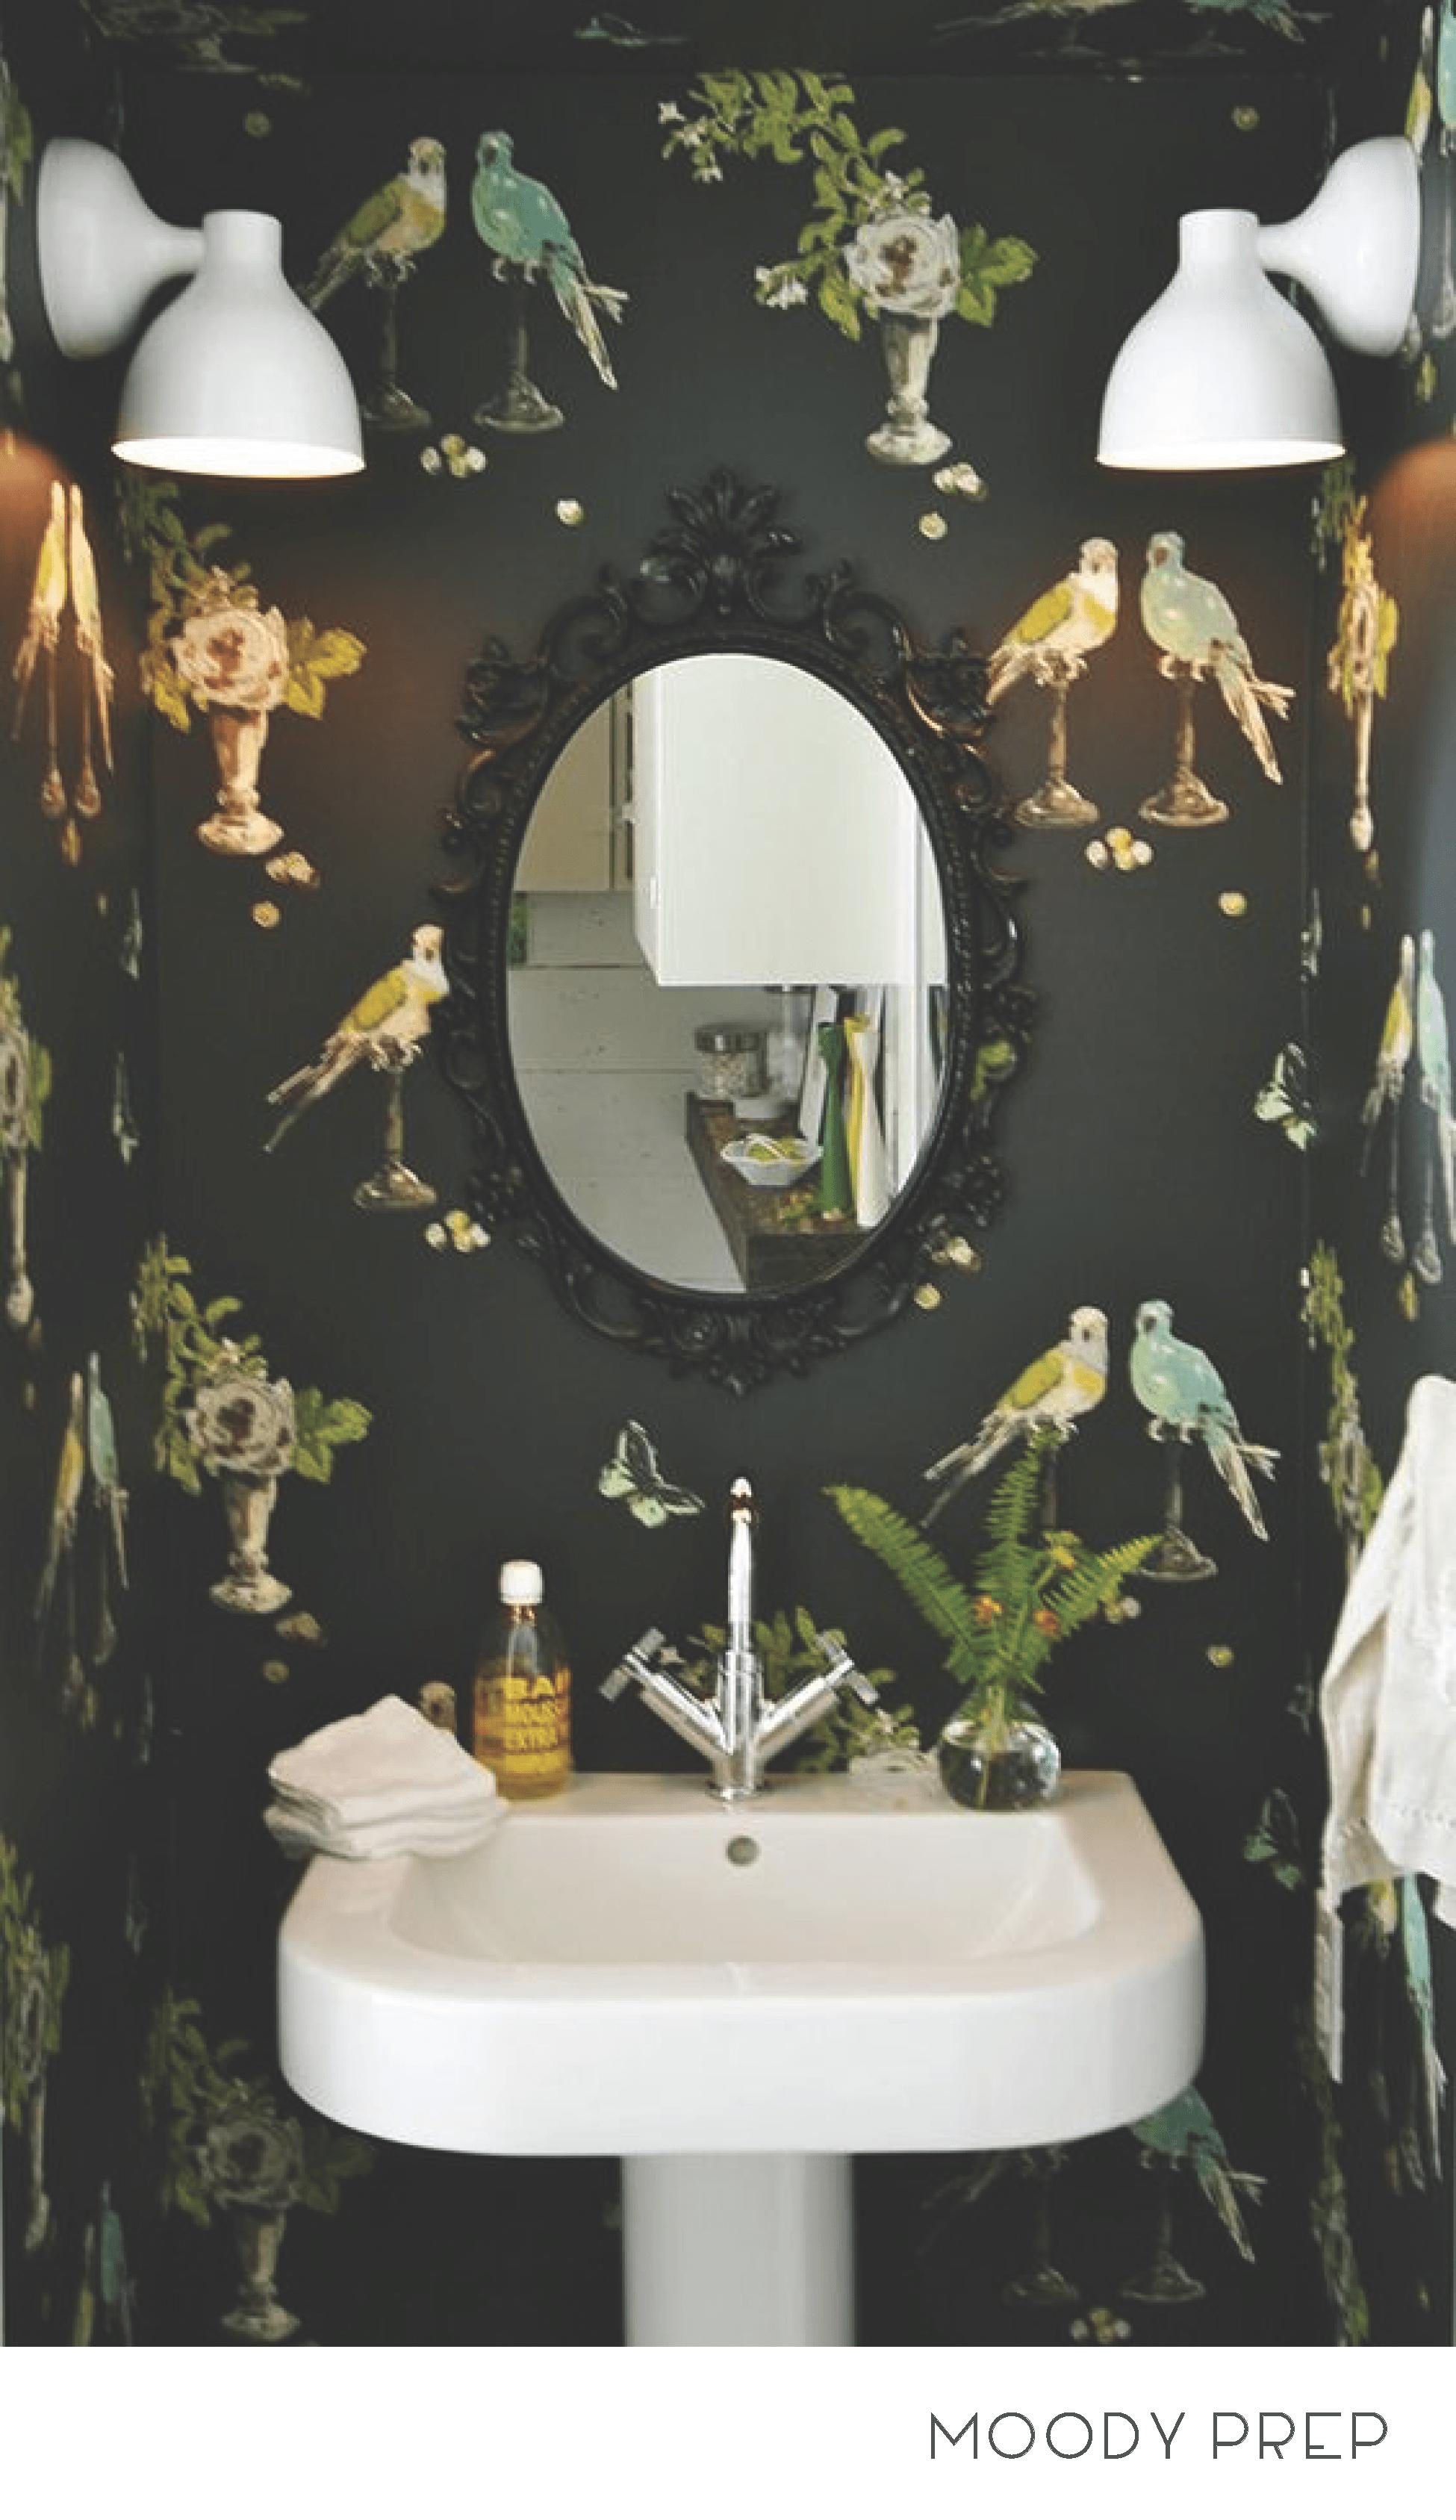 Preppy Style 9 Different Ways Master Bathroom Makeover Bathroom Makeover Bathroom Wallpaper